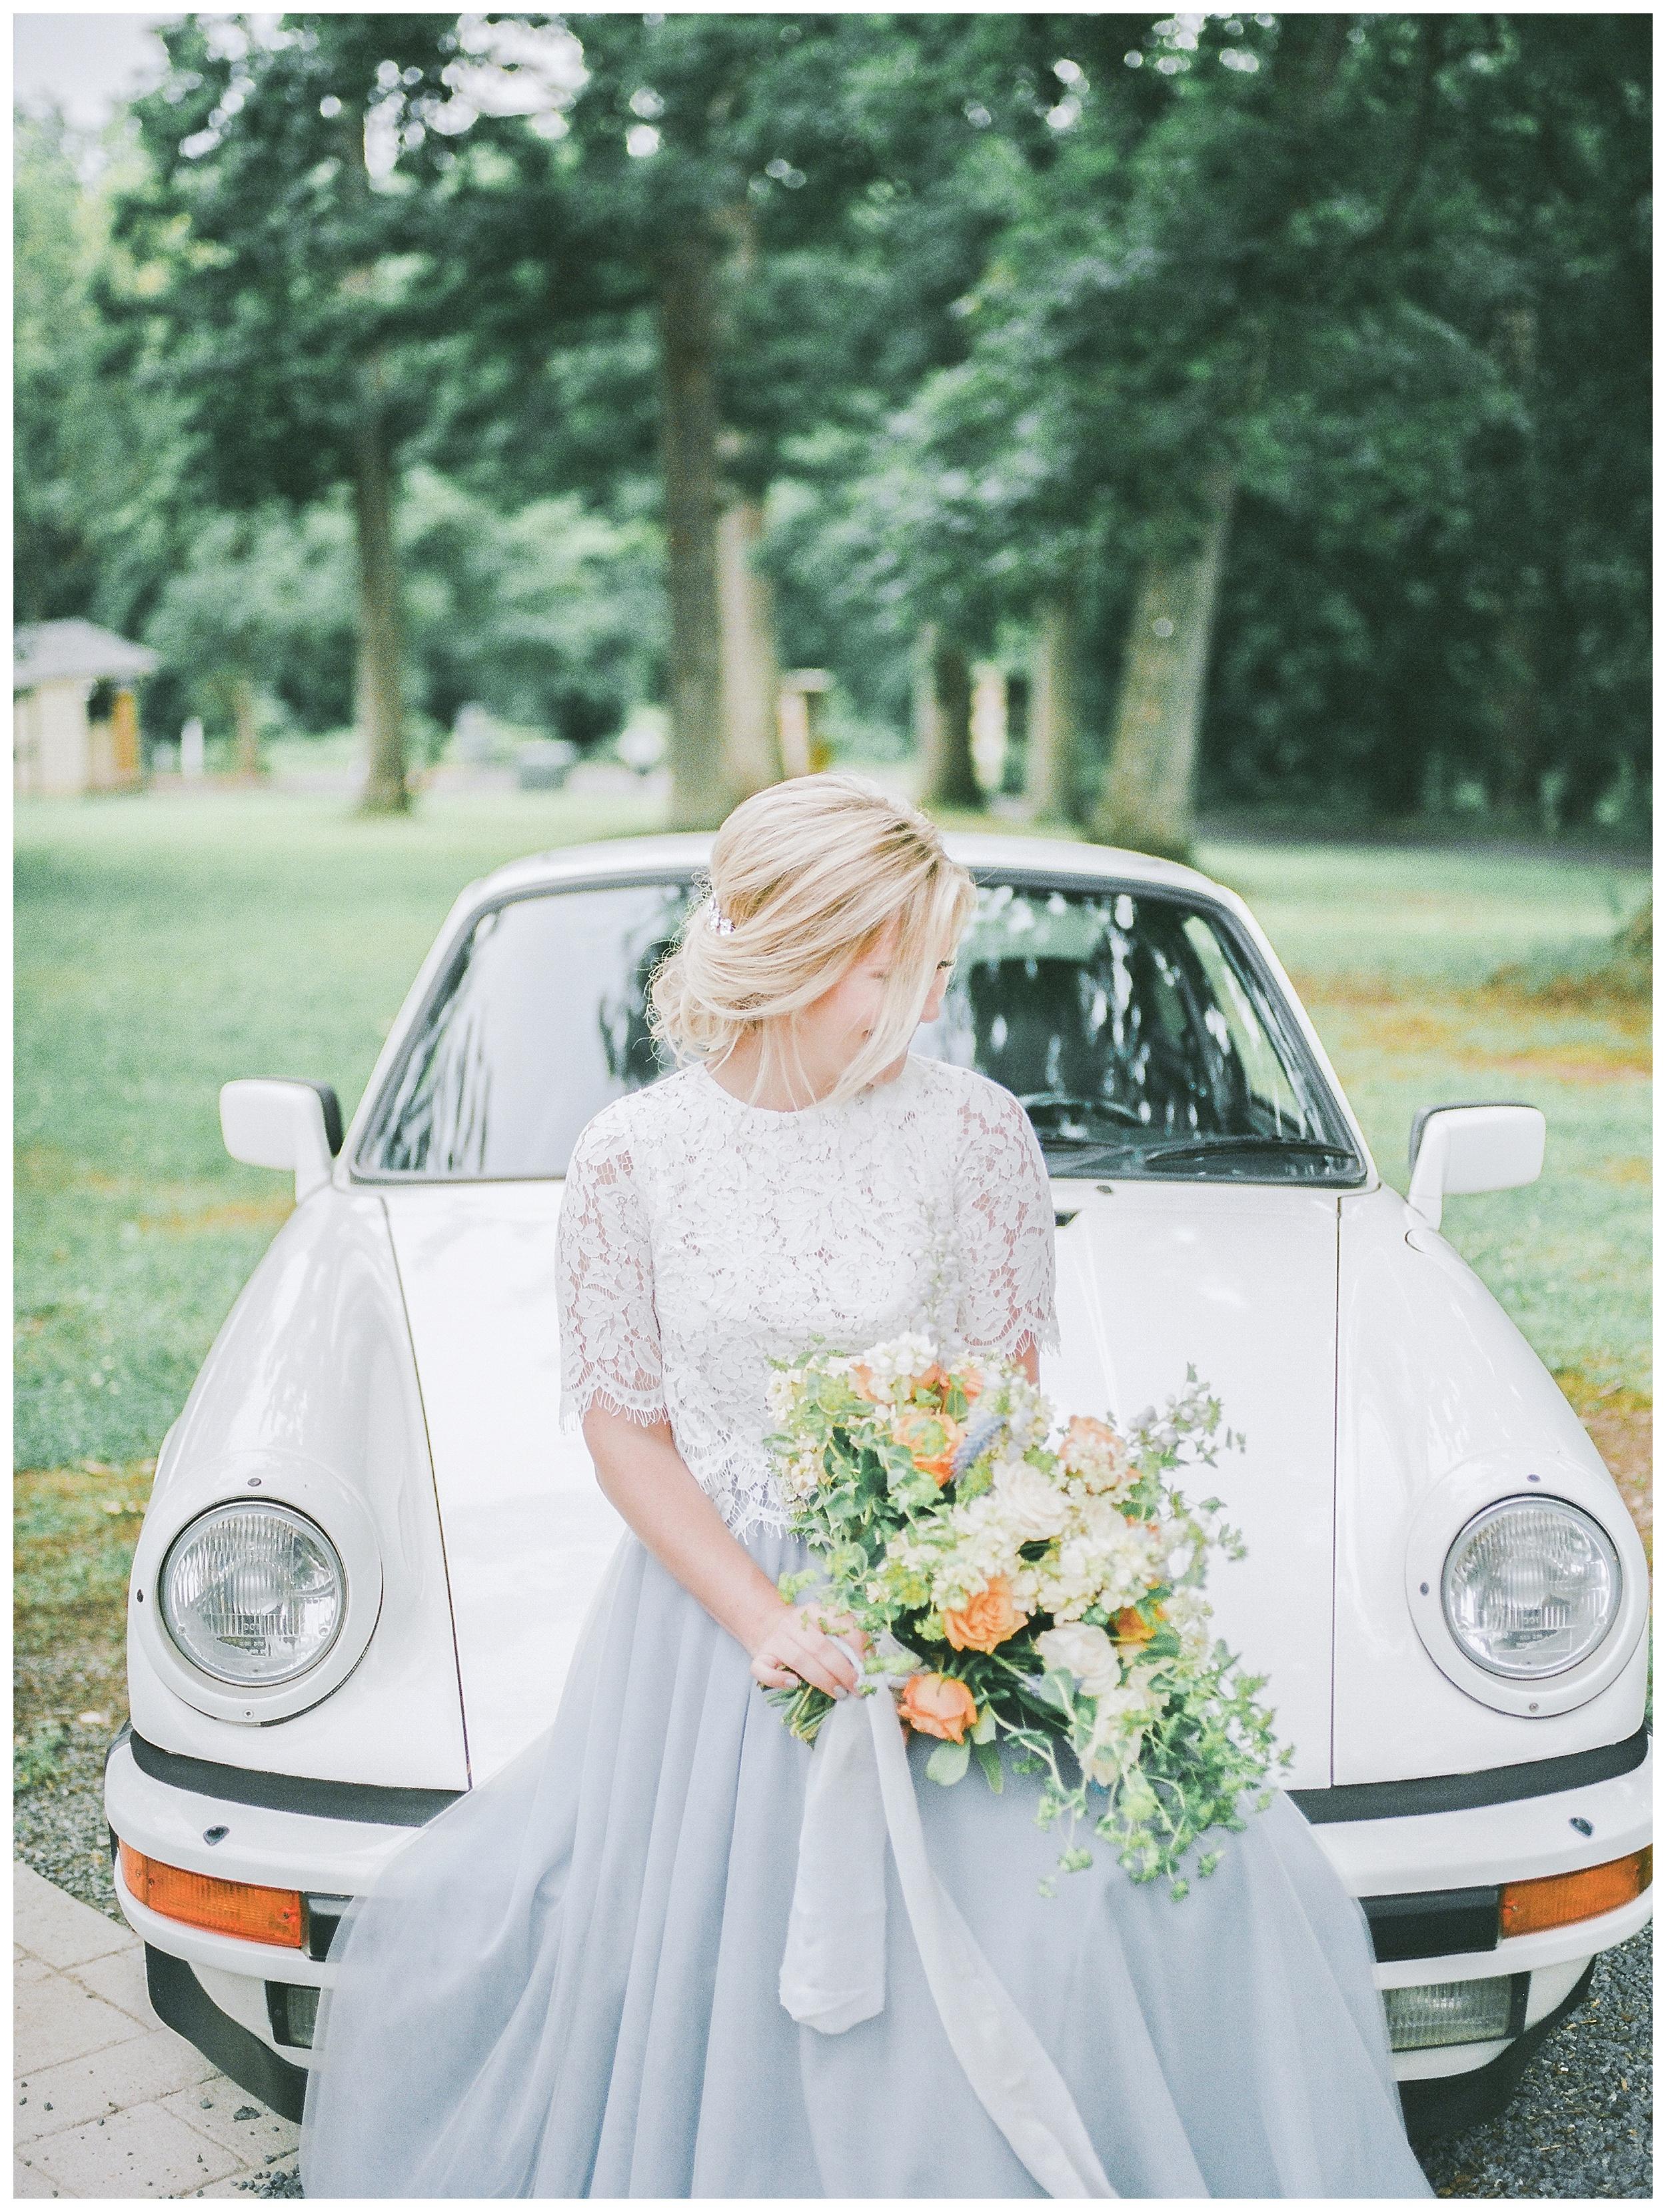 Rust Manor Wedding   Virginia Wedding Photographer Kir Tuben_0054.jpg